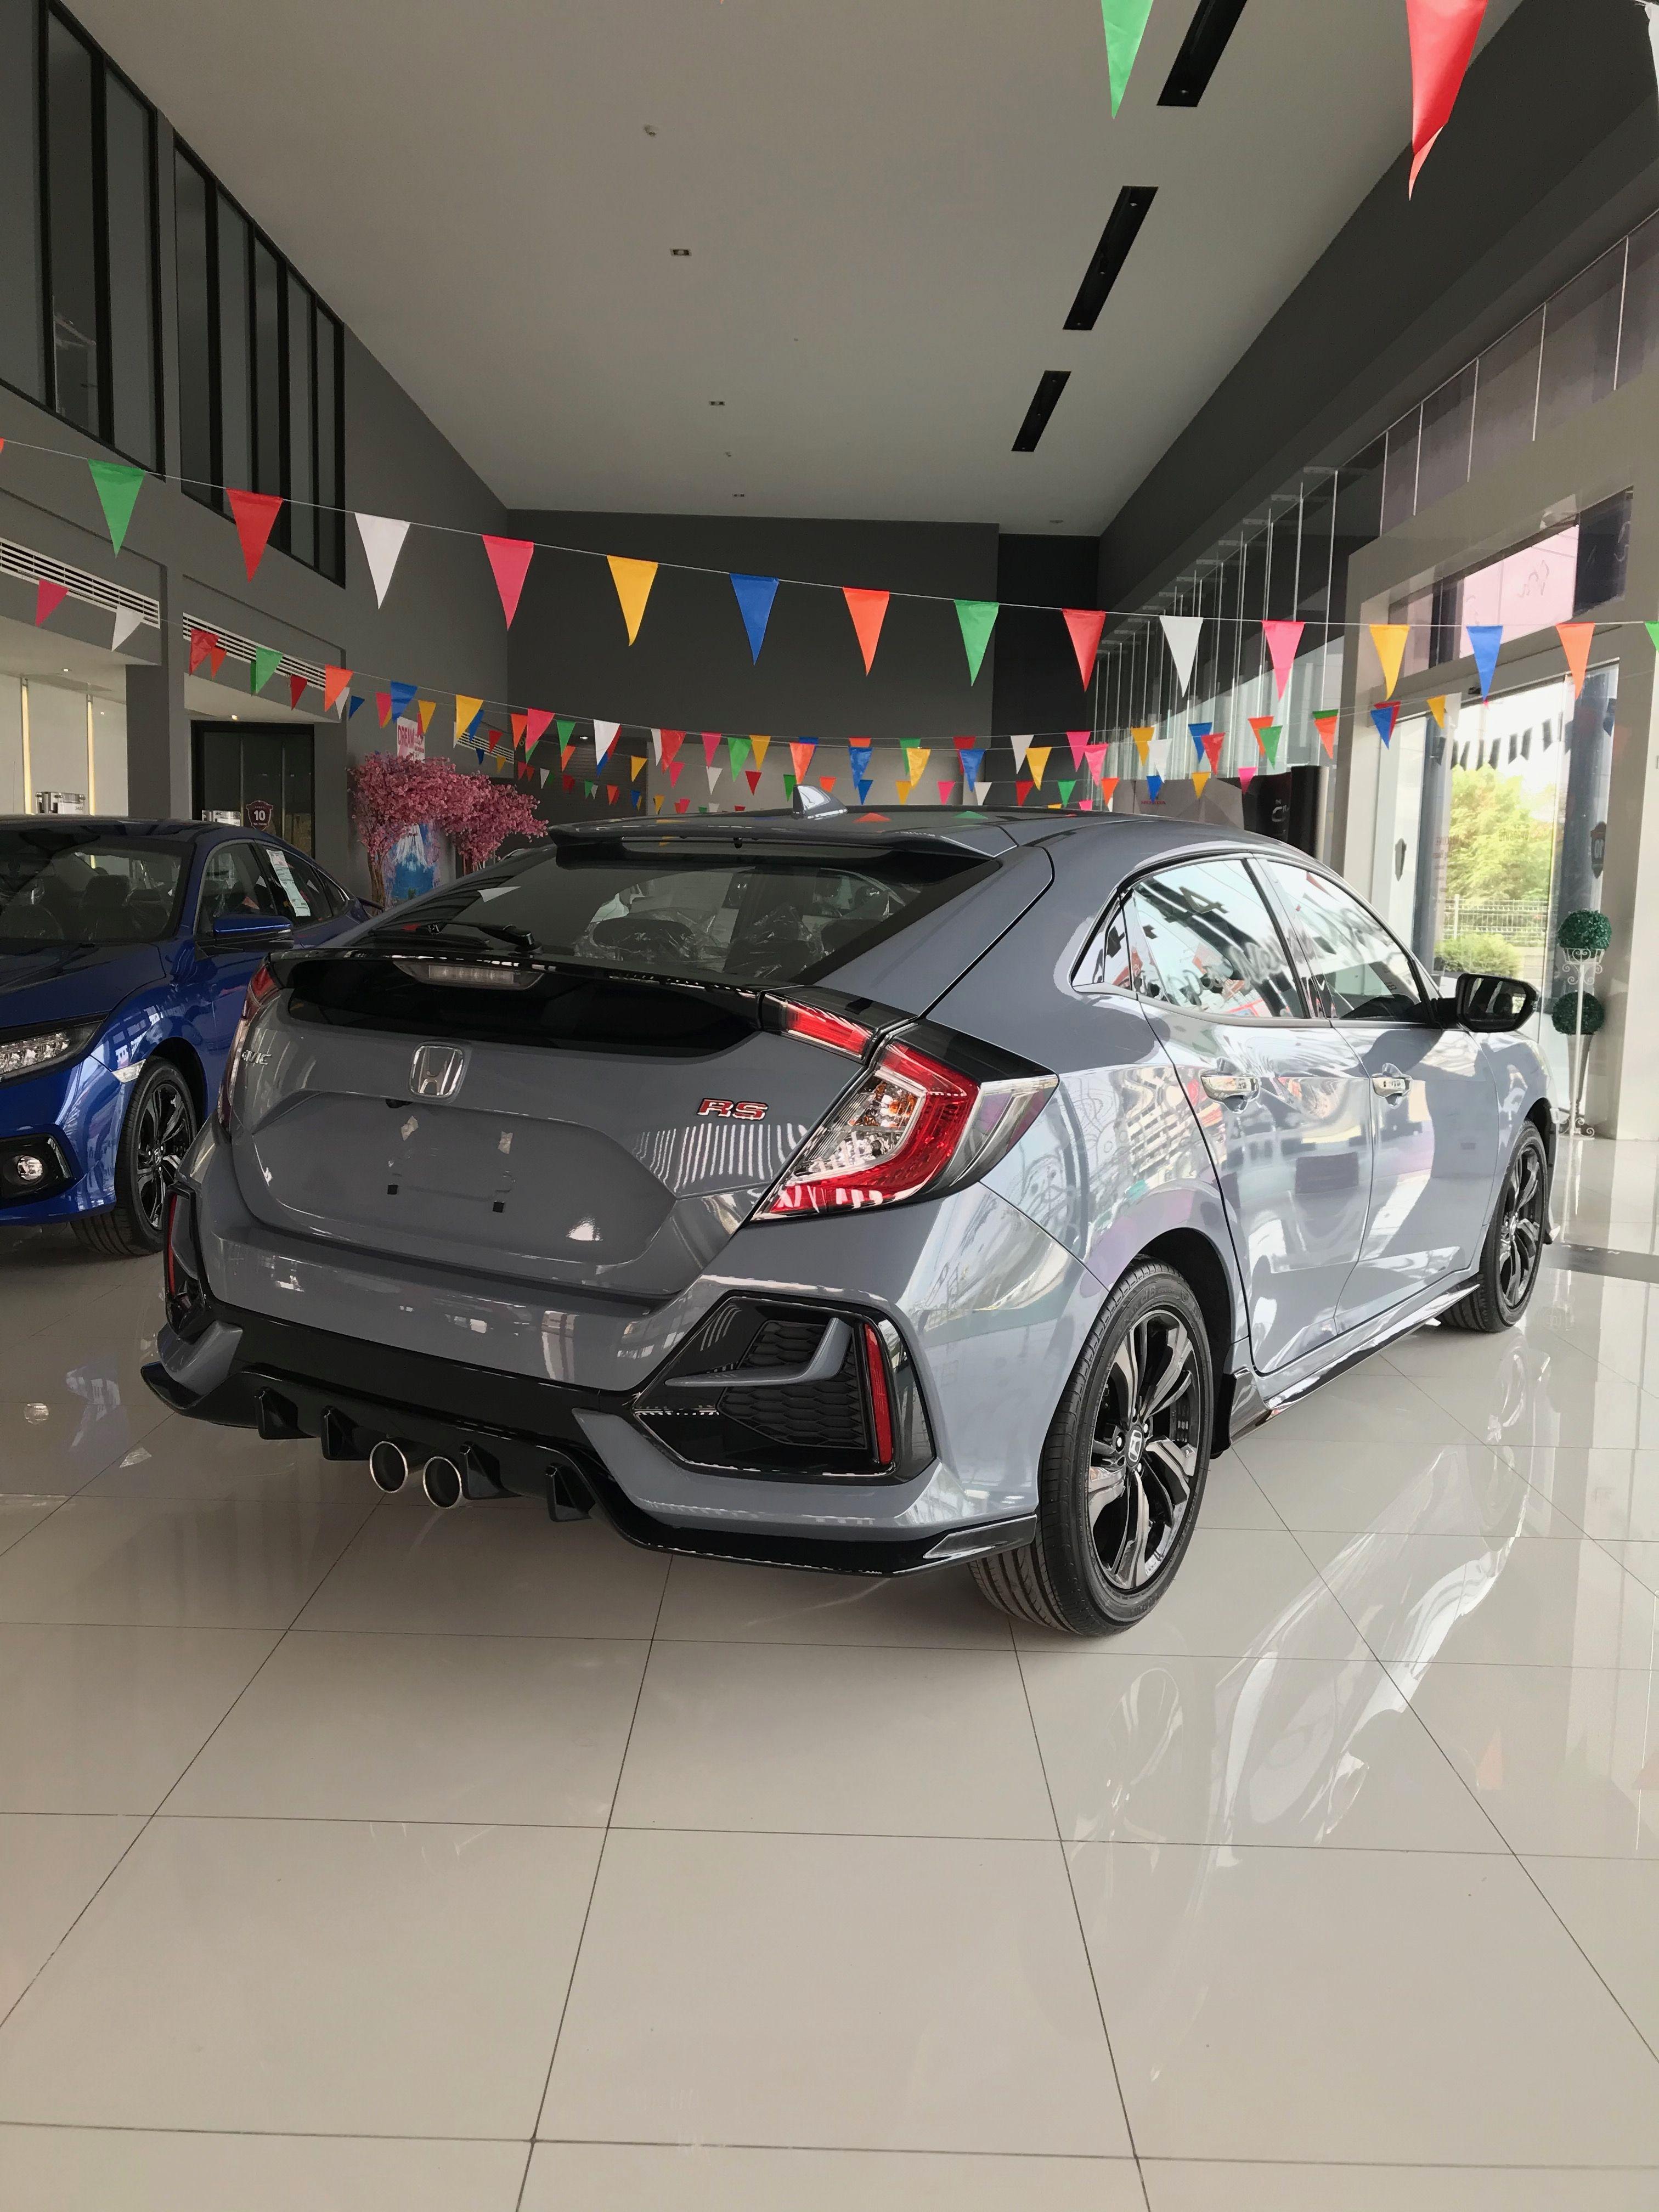 Honda Civic Hatchback Rs 28 Lakh Real Life Review In 2021 Honda Civic Hatchback Civic Hatchback Honda Civic